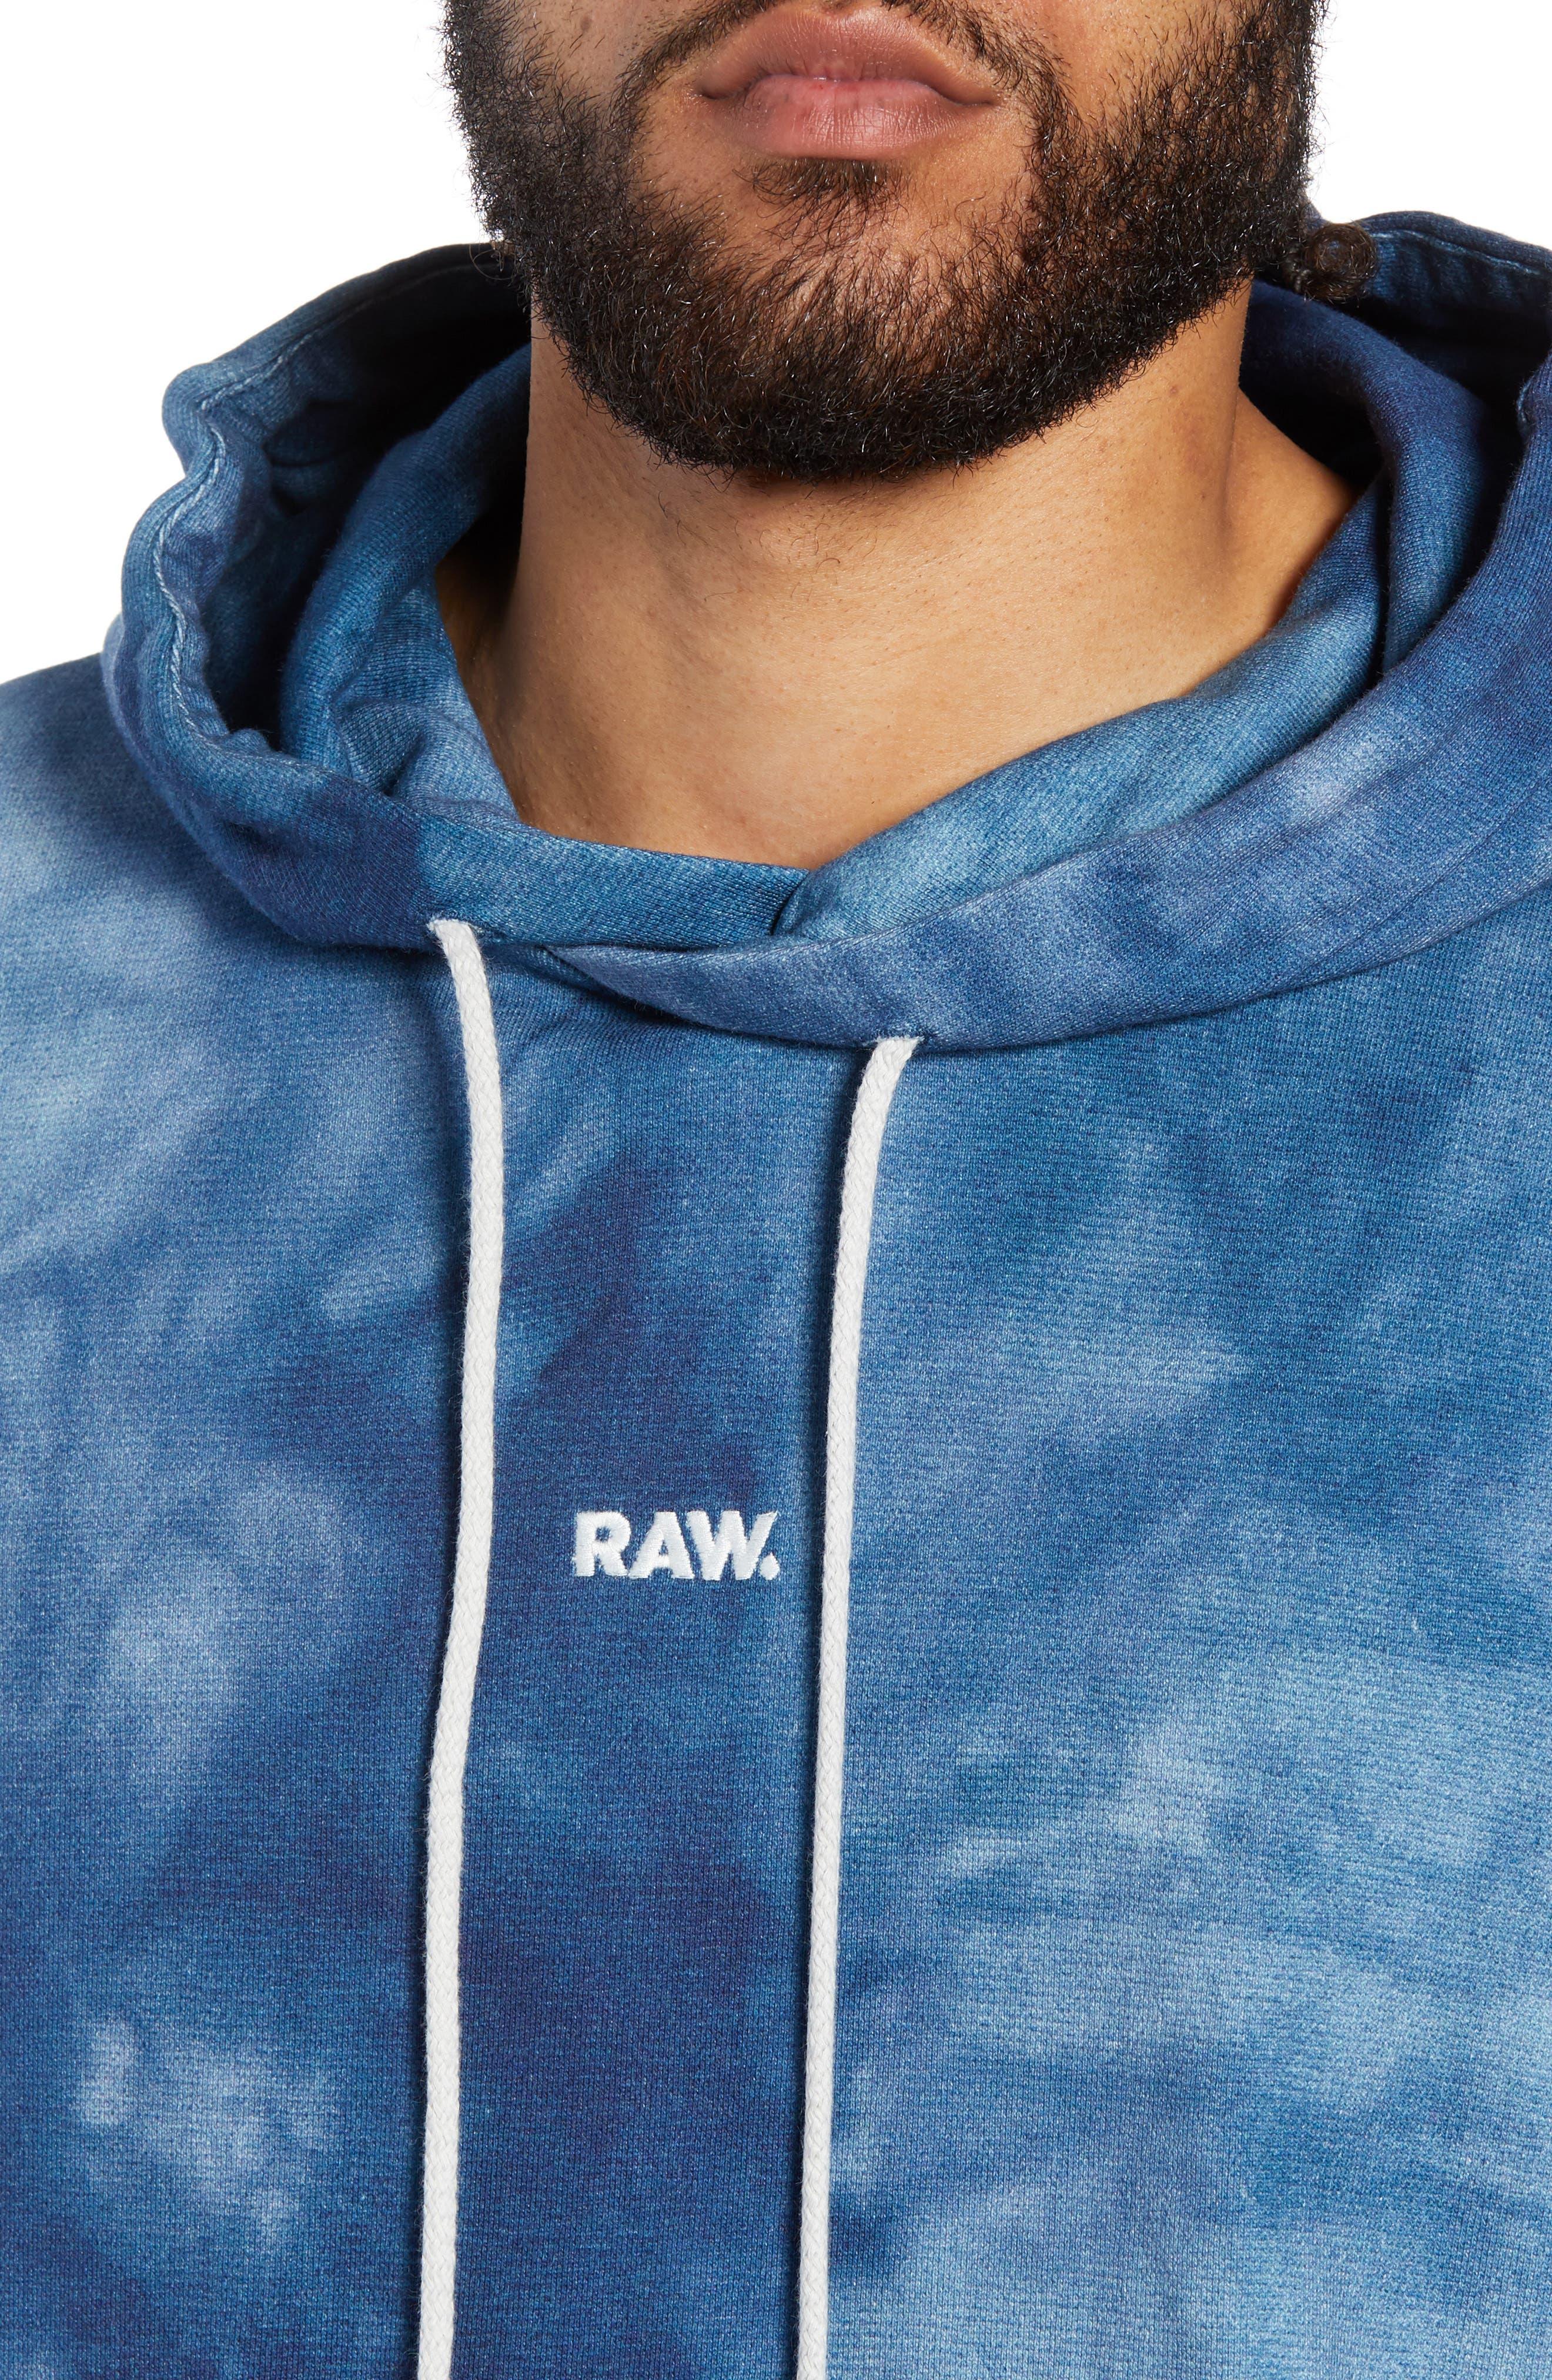 Cryrer Waterfall Hooded Sweatshirt,                             Alternate thumbnail 4, color,                             TEAL BLUE